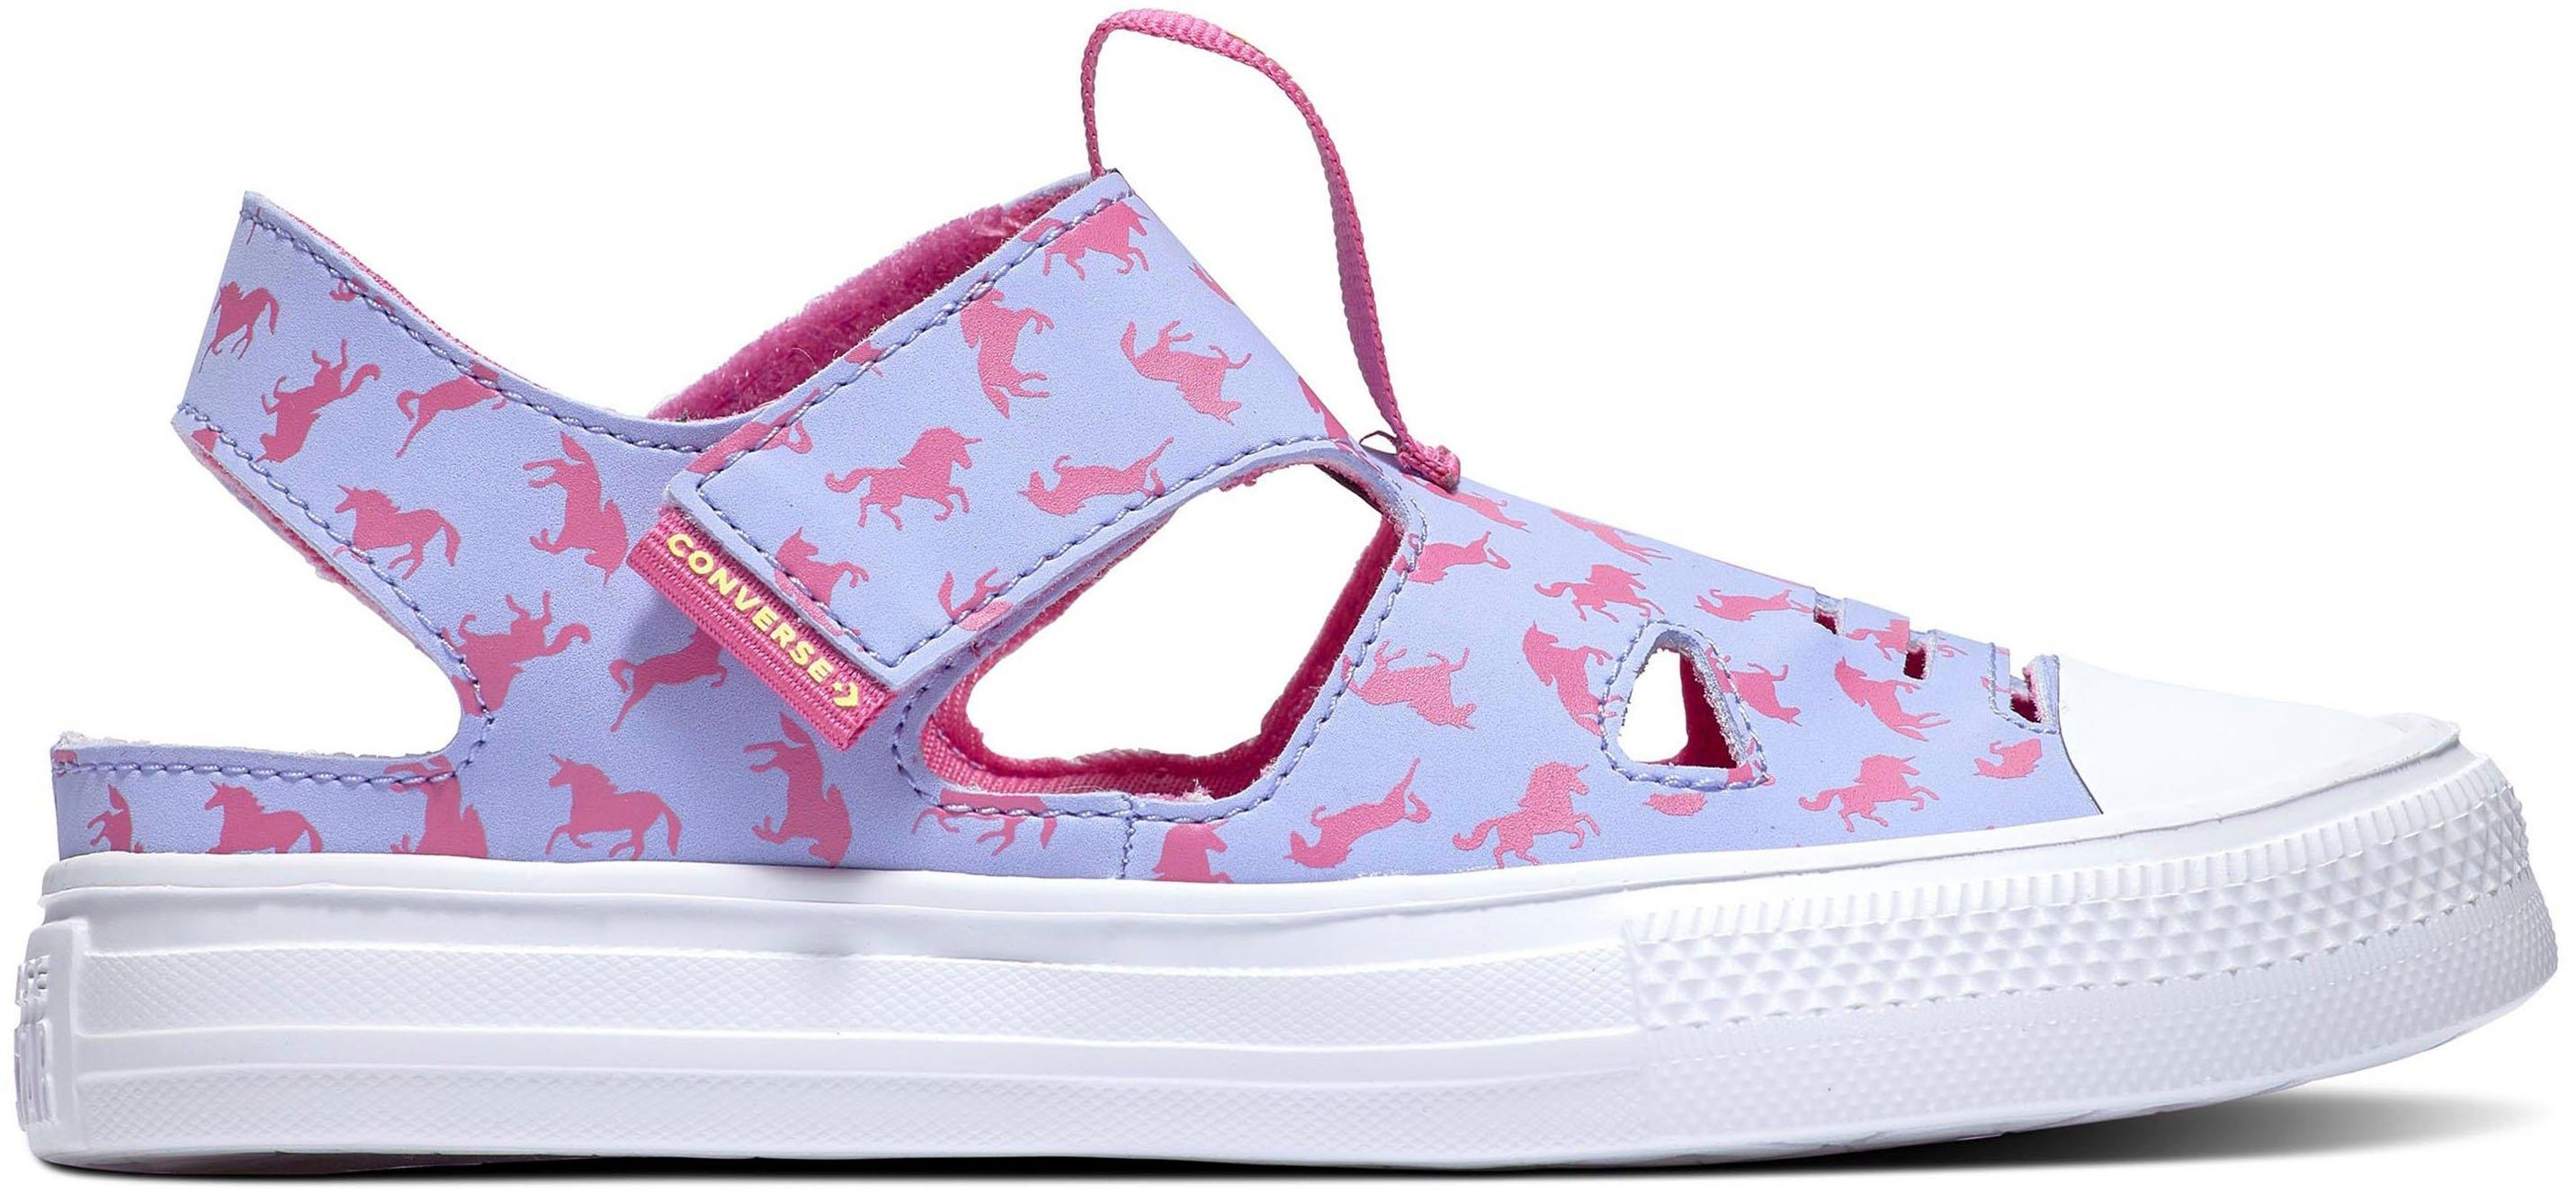 Converse sandalen CHUCK TAYLOR ALL STAR SUPERPLAY DIN voordelig en veilig online kopen